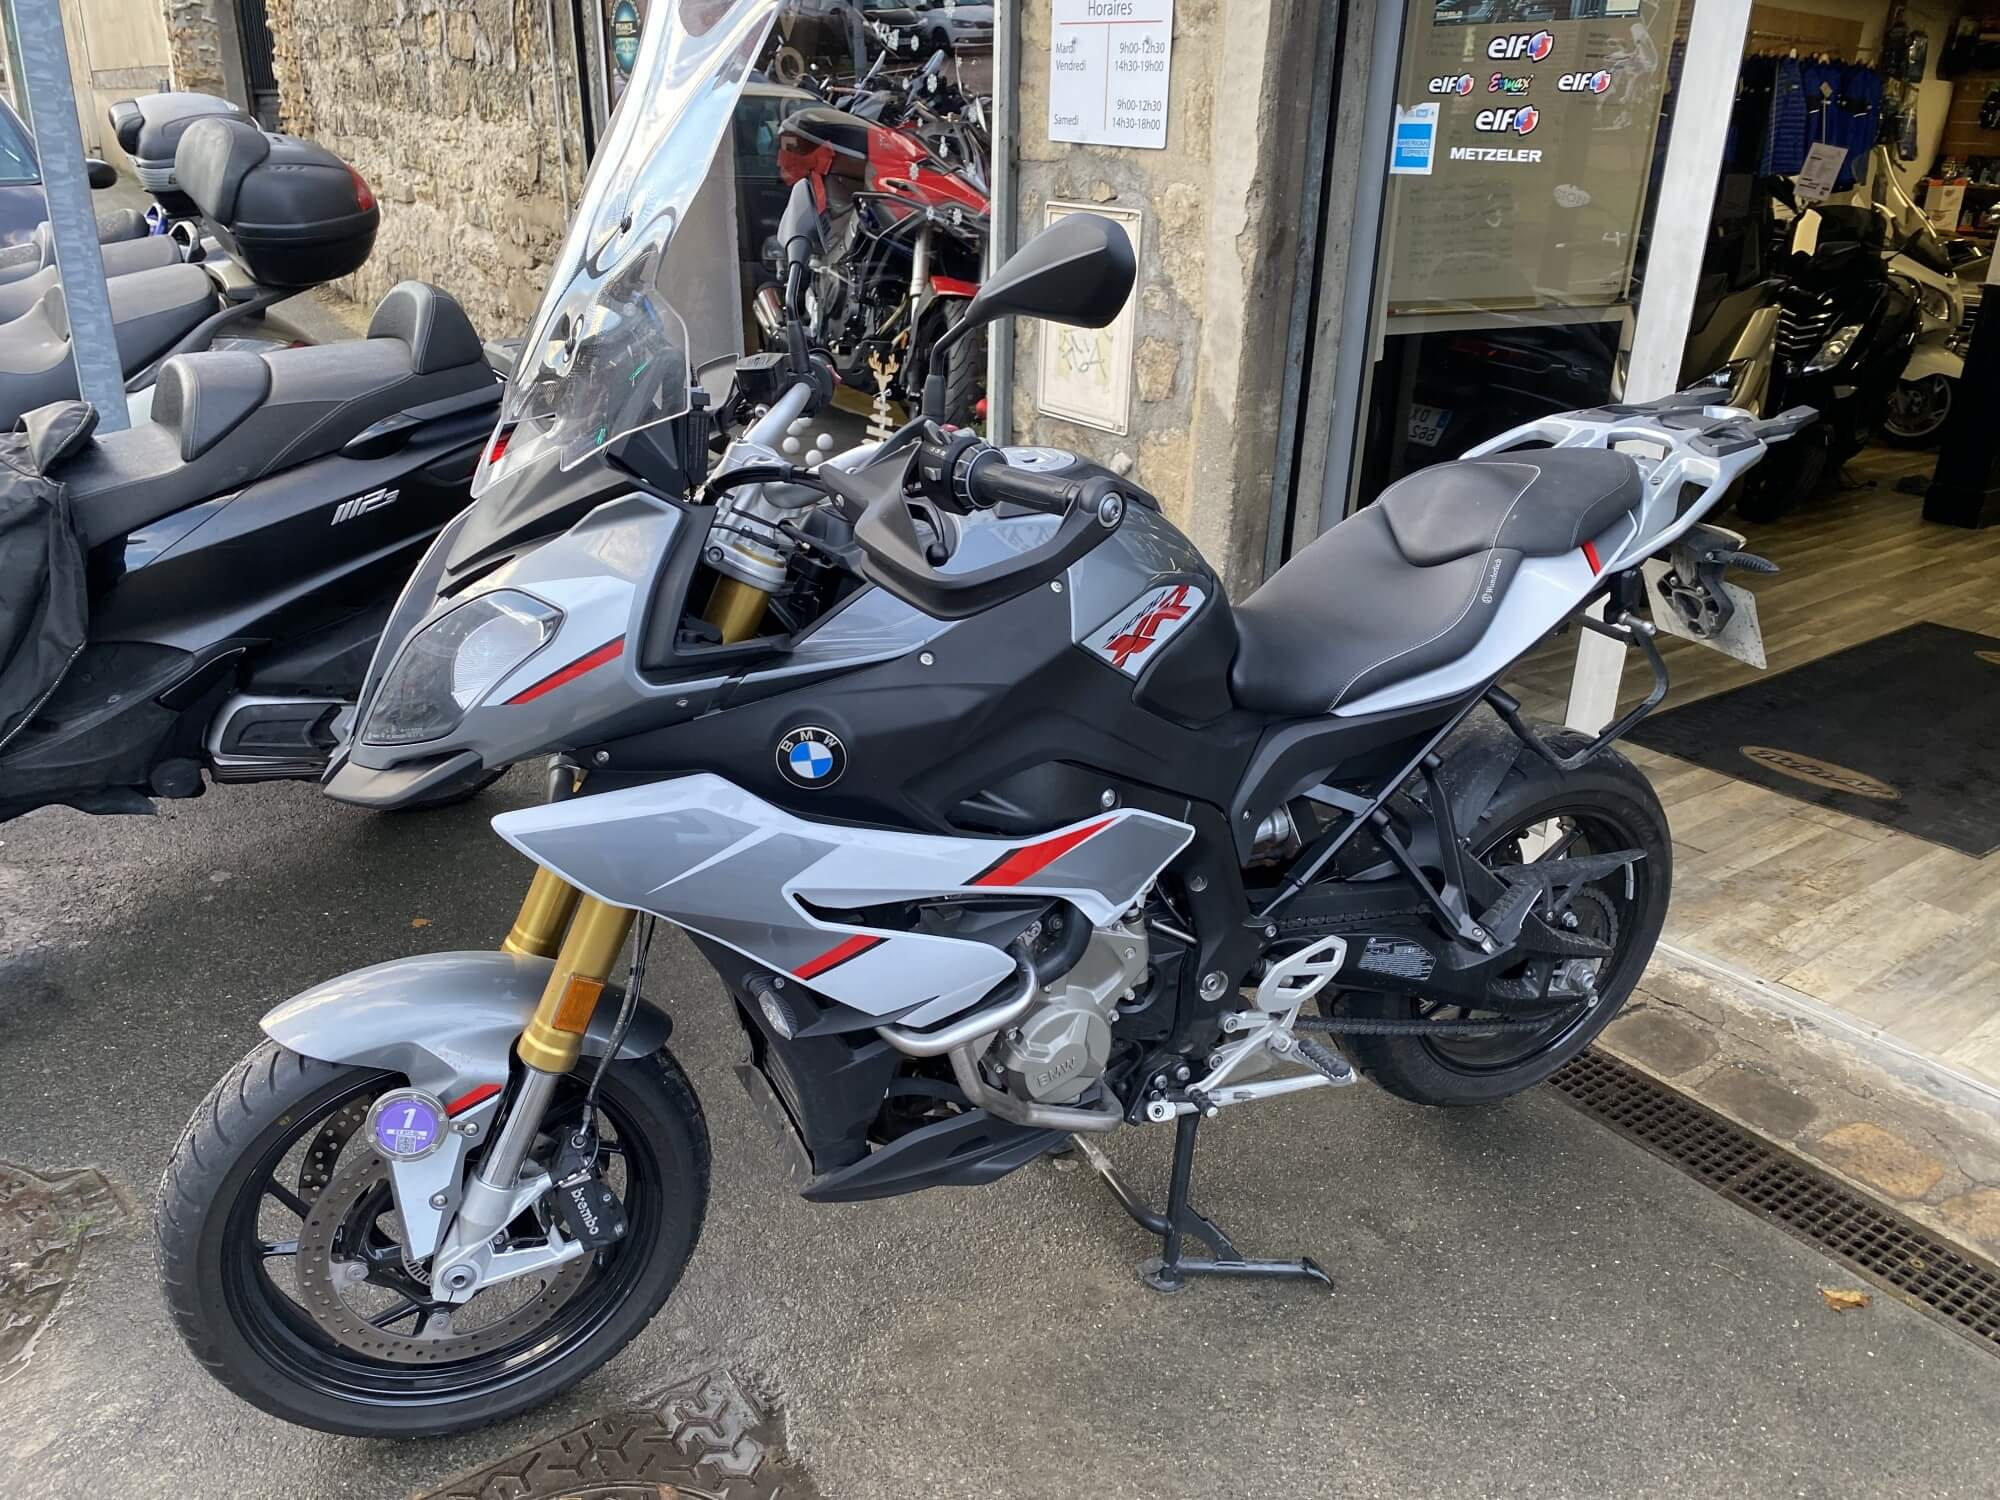 bmw s 1000 d'occasion chez Chambourcy motos 78